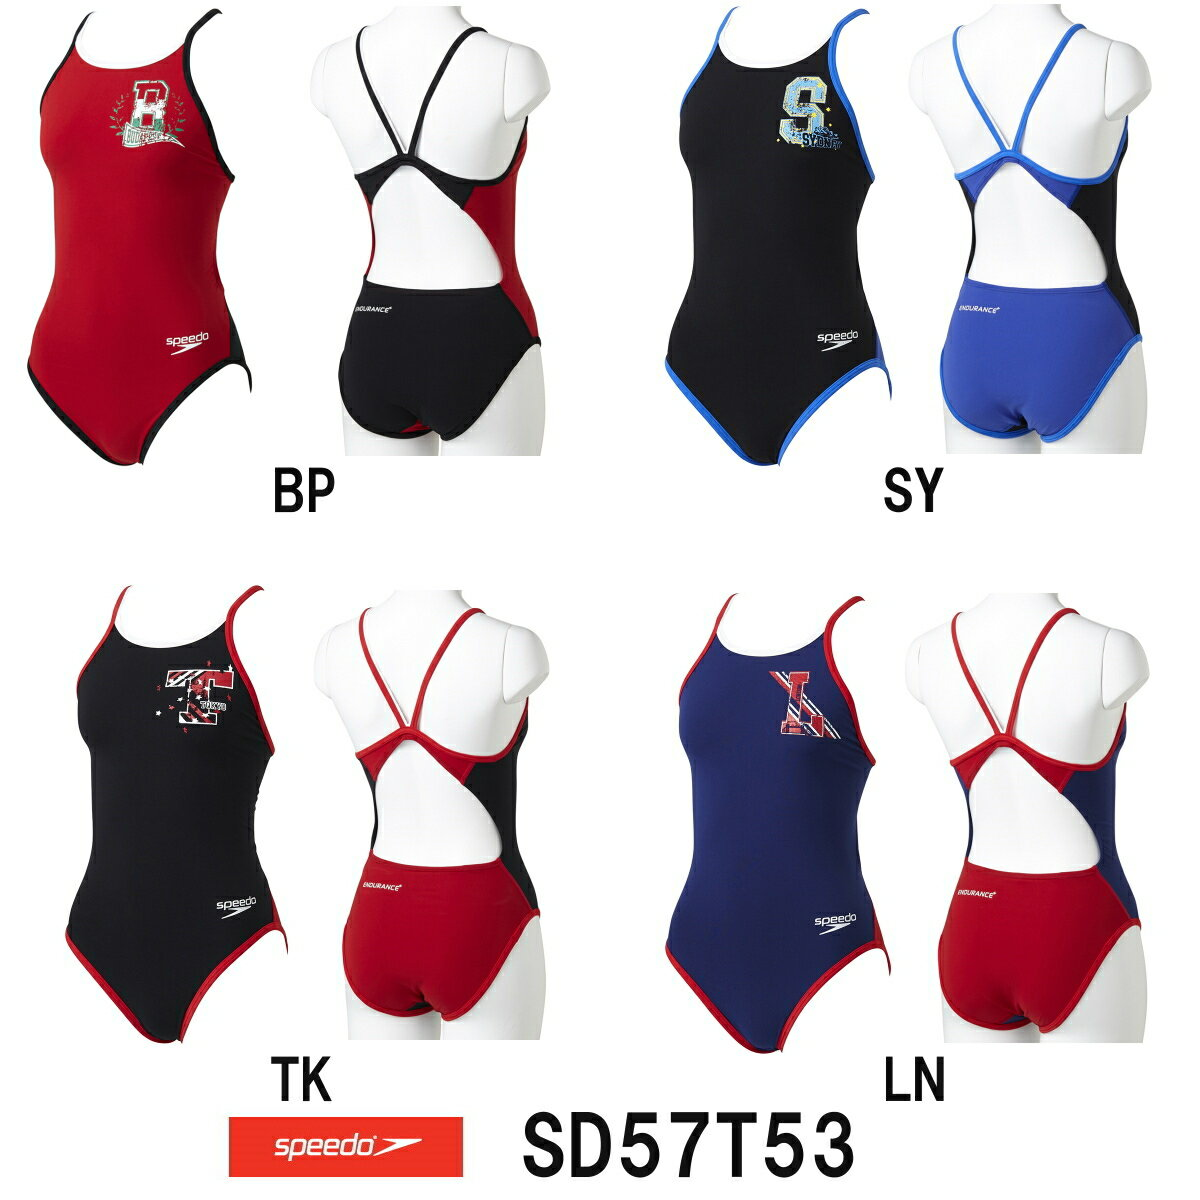 【SD57T53】SPEEDO(スピード)レディース競泳練習水着DREAMTEAMENDURANCEJウイメンズトレインカットスーツ